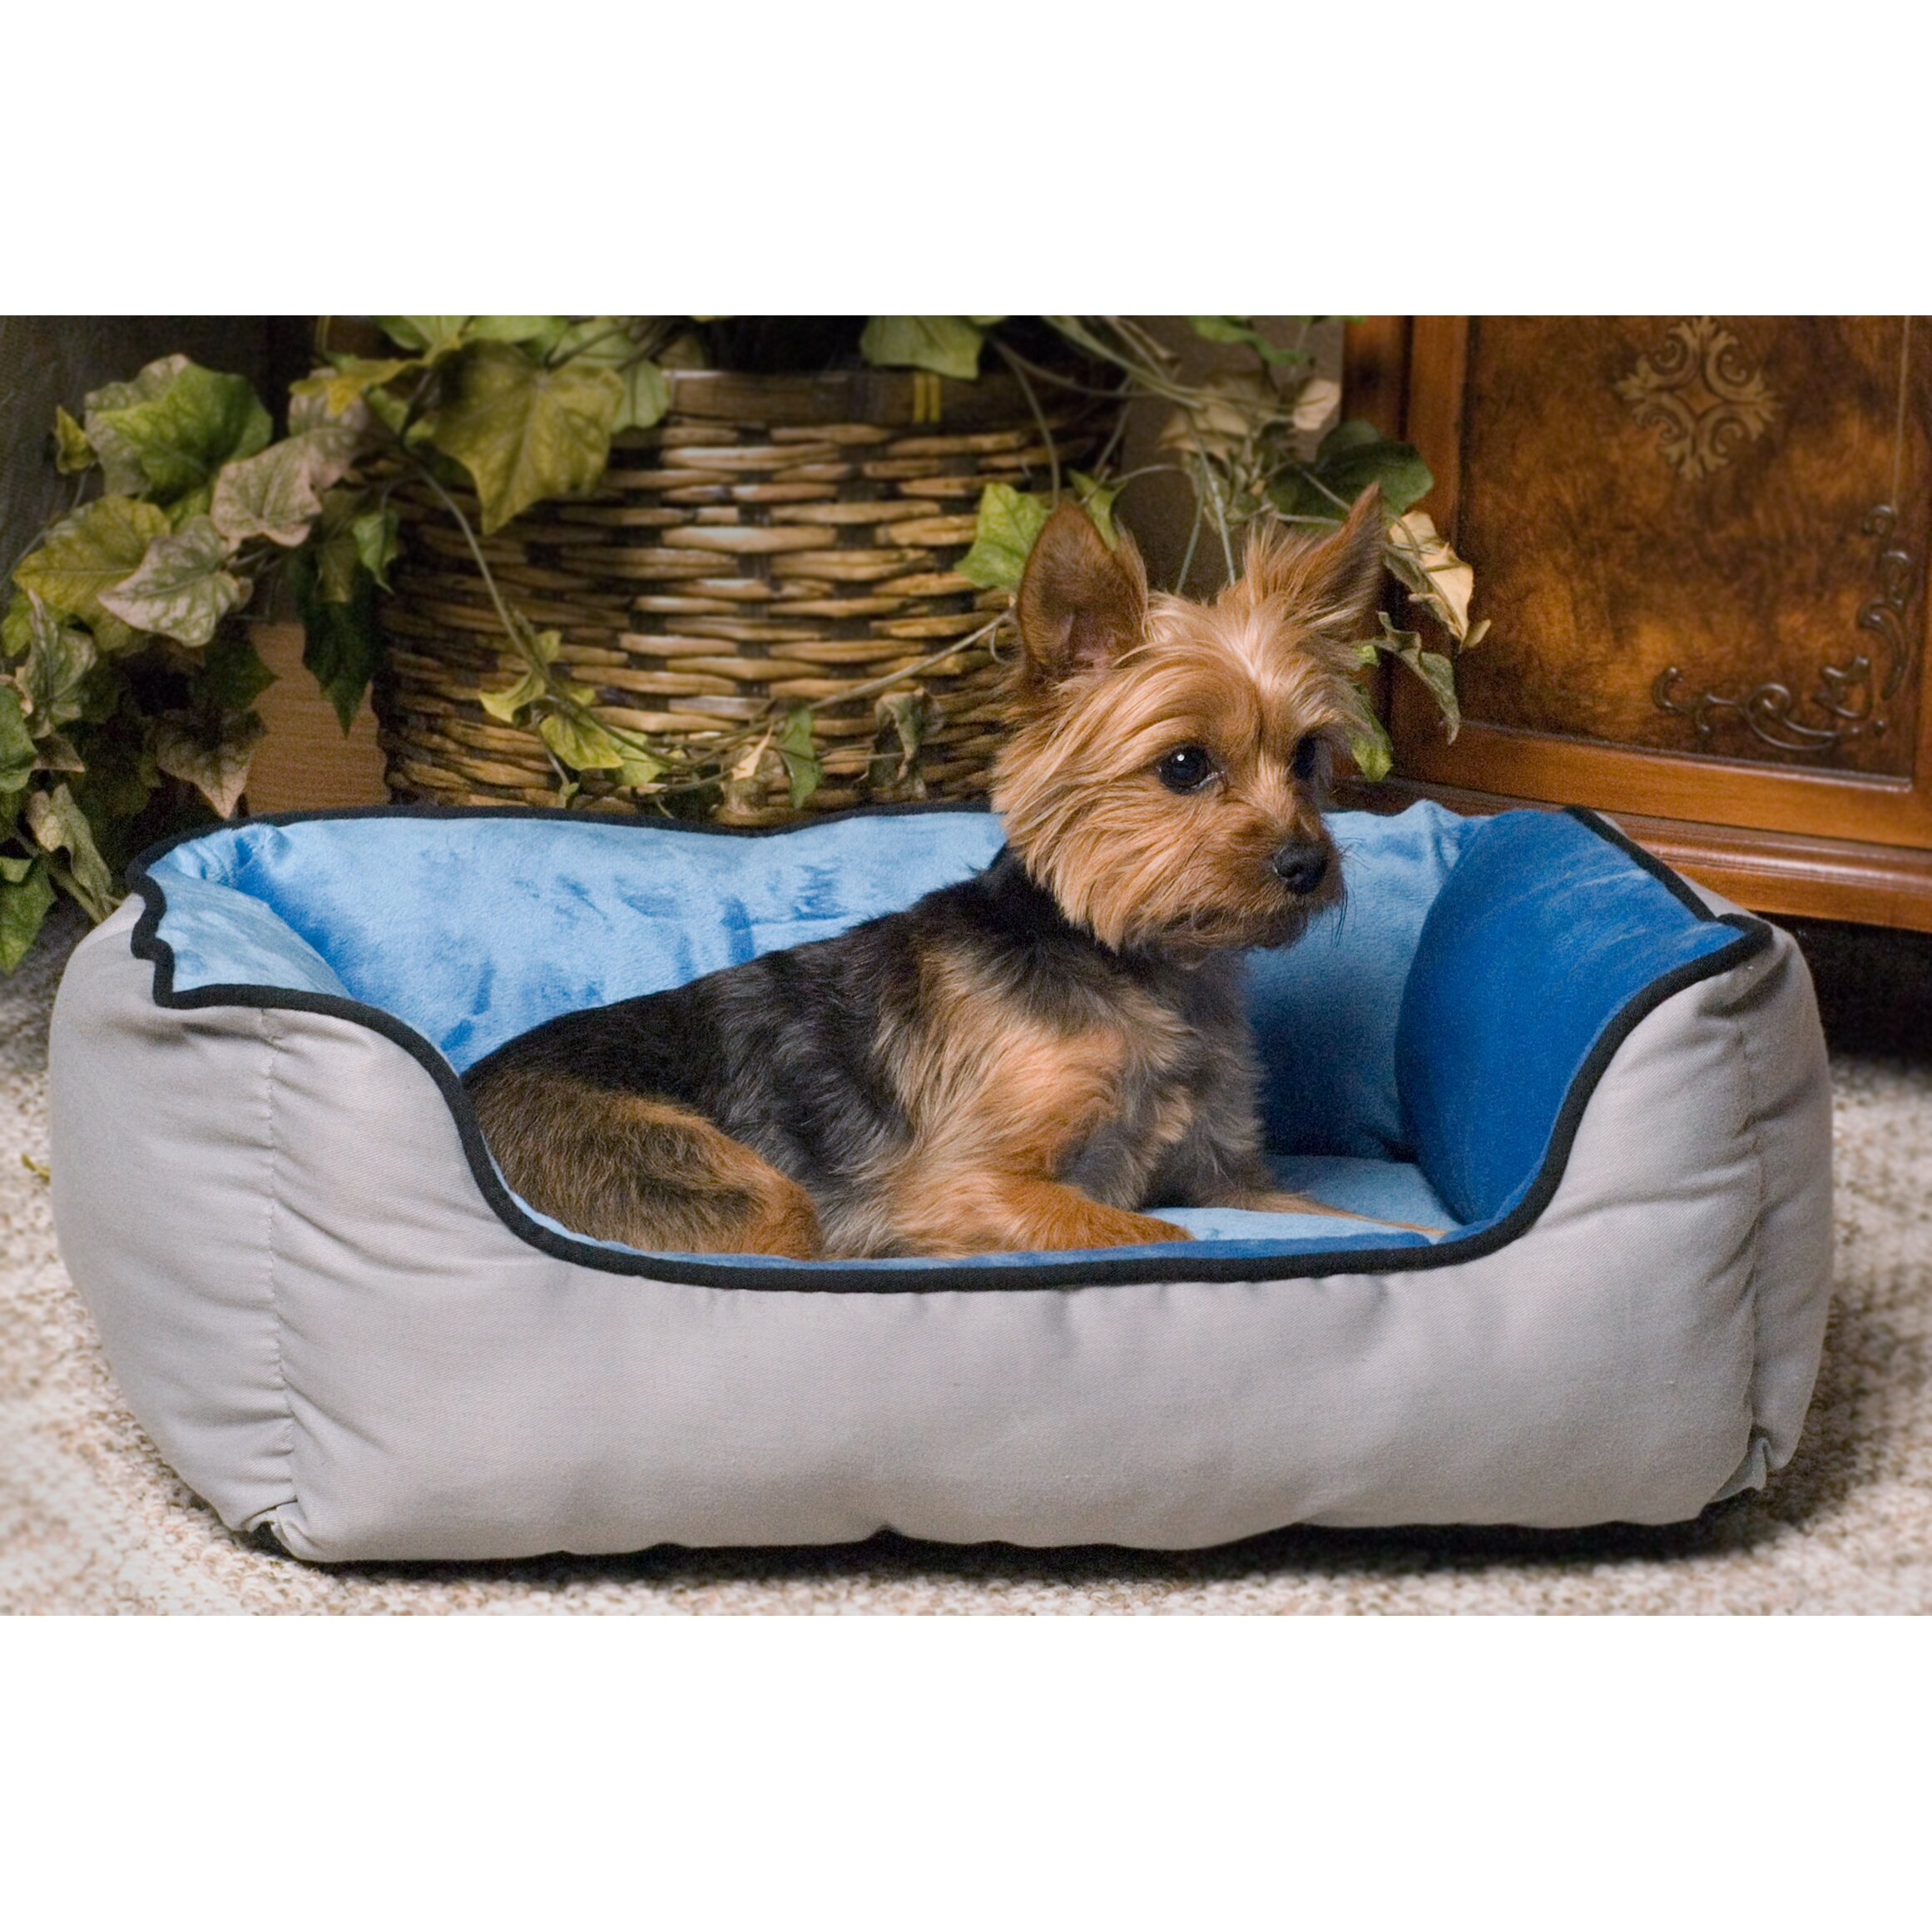 k h manufacturing self warming heated lounge bolster dog bed reviews wayfair. Black Bedroom Furniture Sets. Home Design Ideas